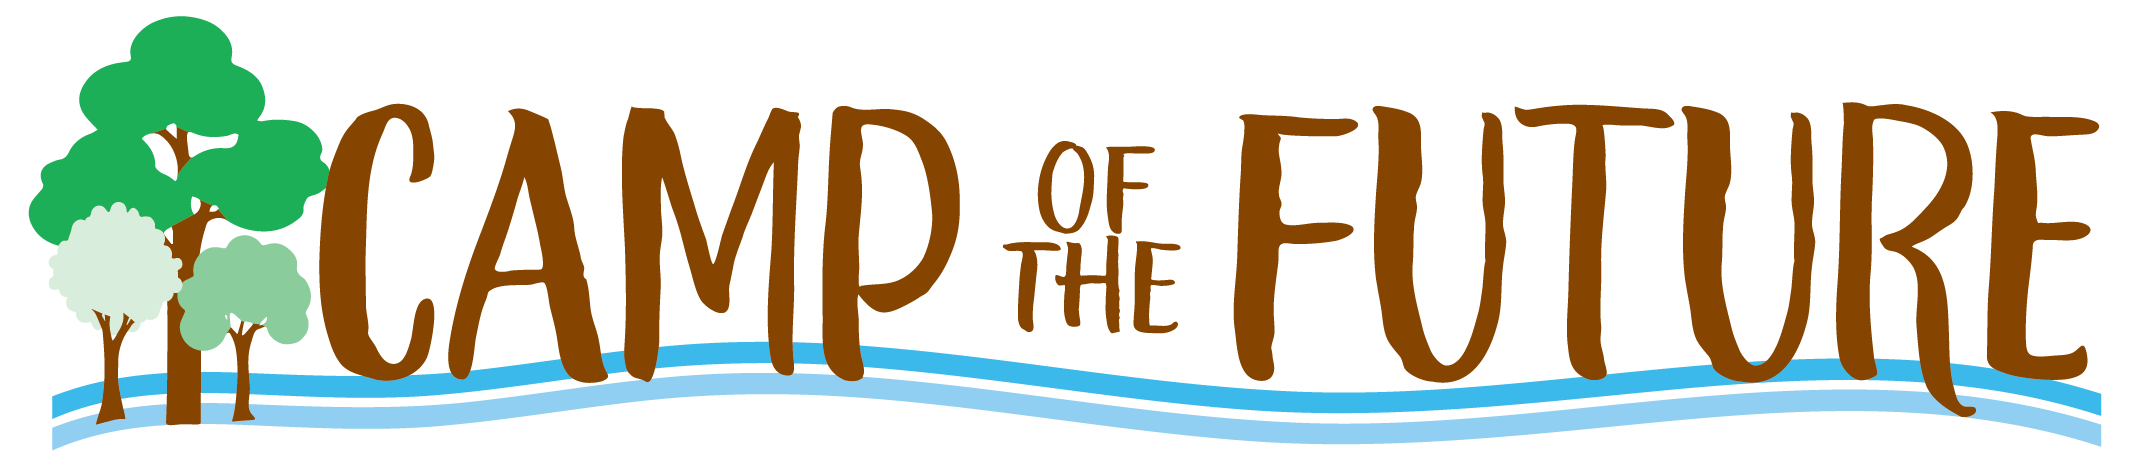 CampoftheFuture_Logo_Artboard 27.png